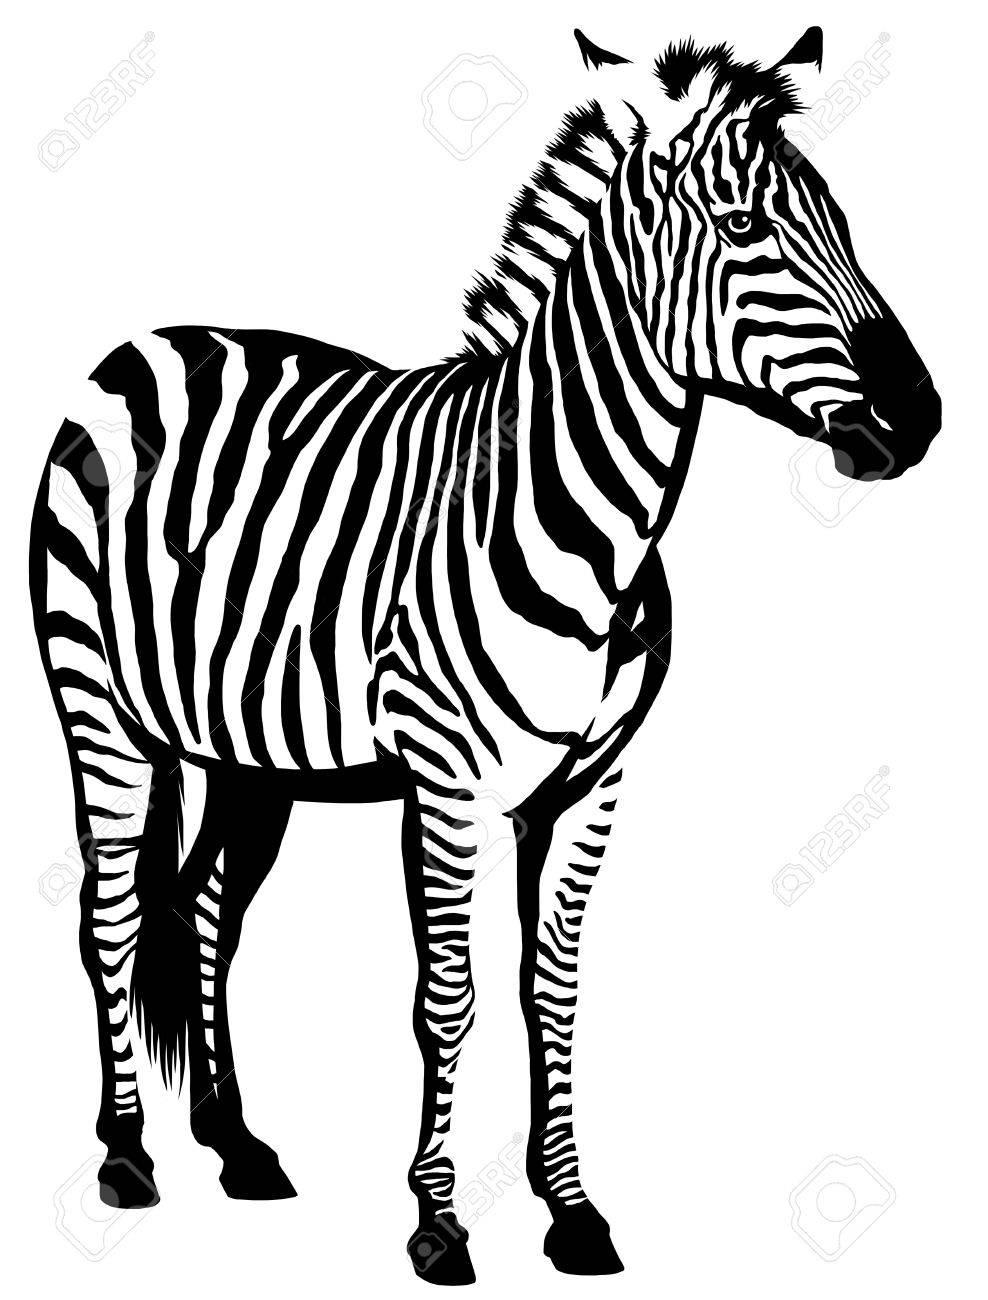 Black And White Linear Paint Draw Zebra Illustration Stock Photo